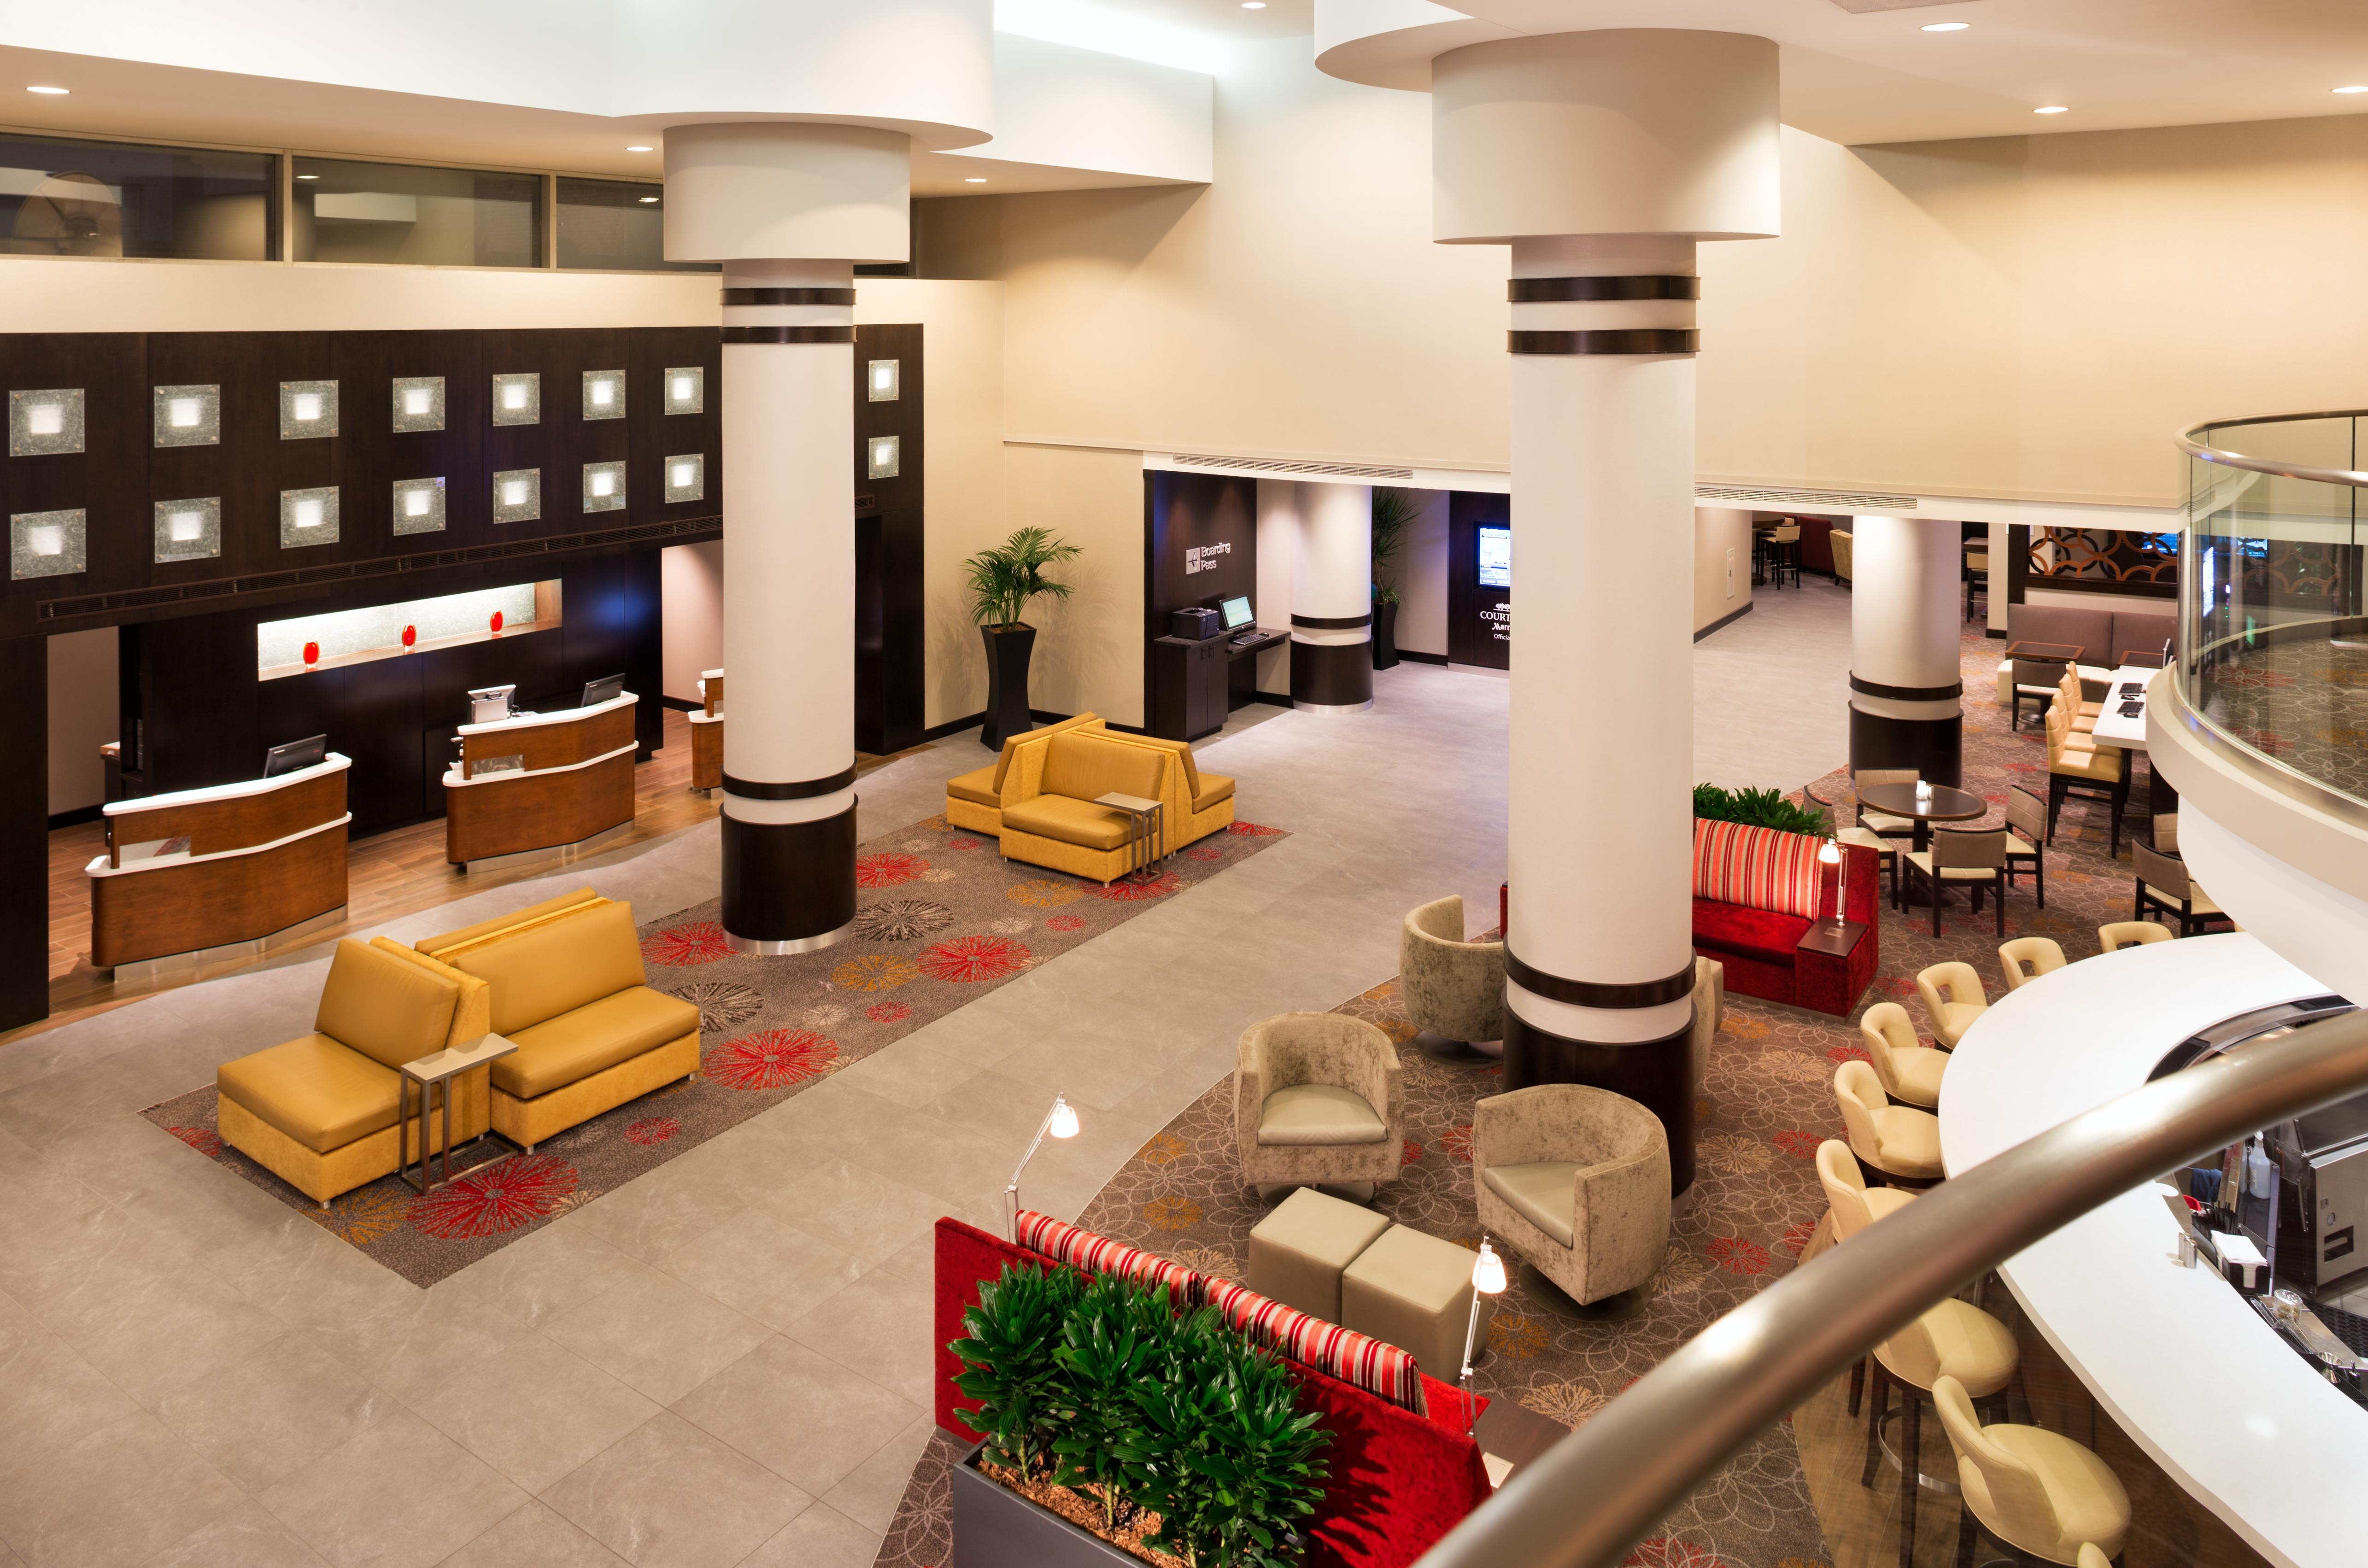 4.Lobby